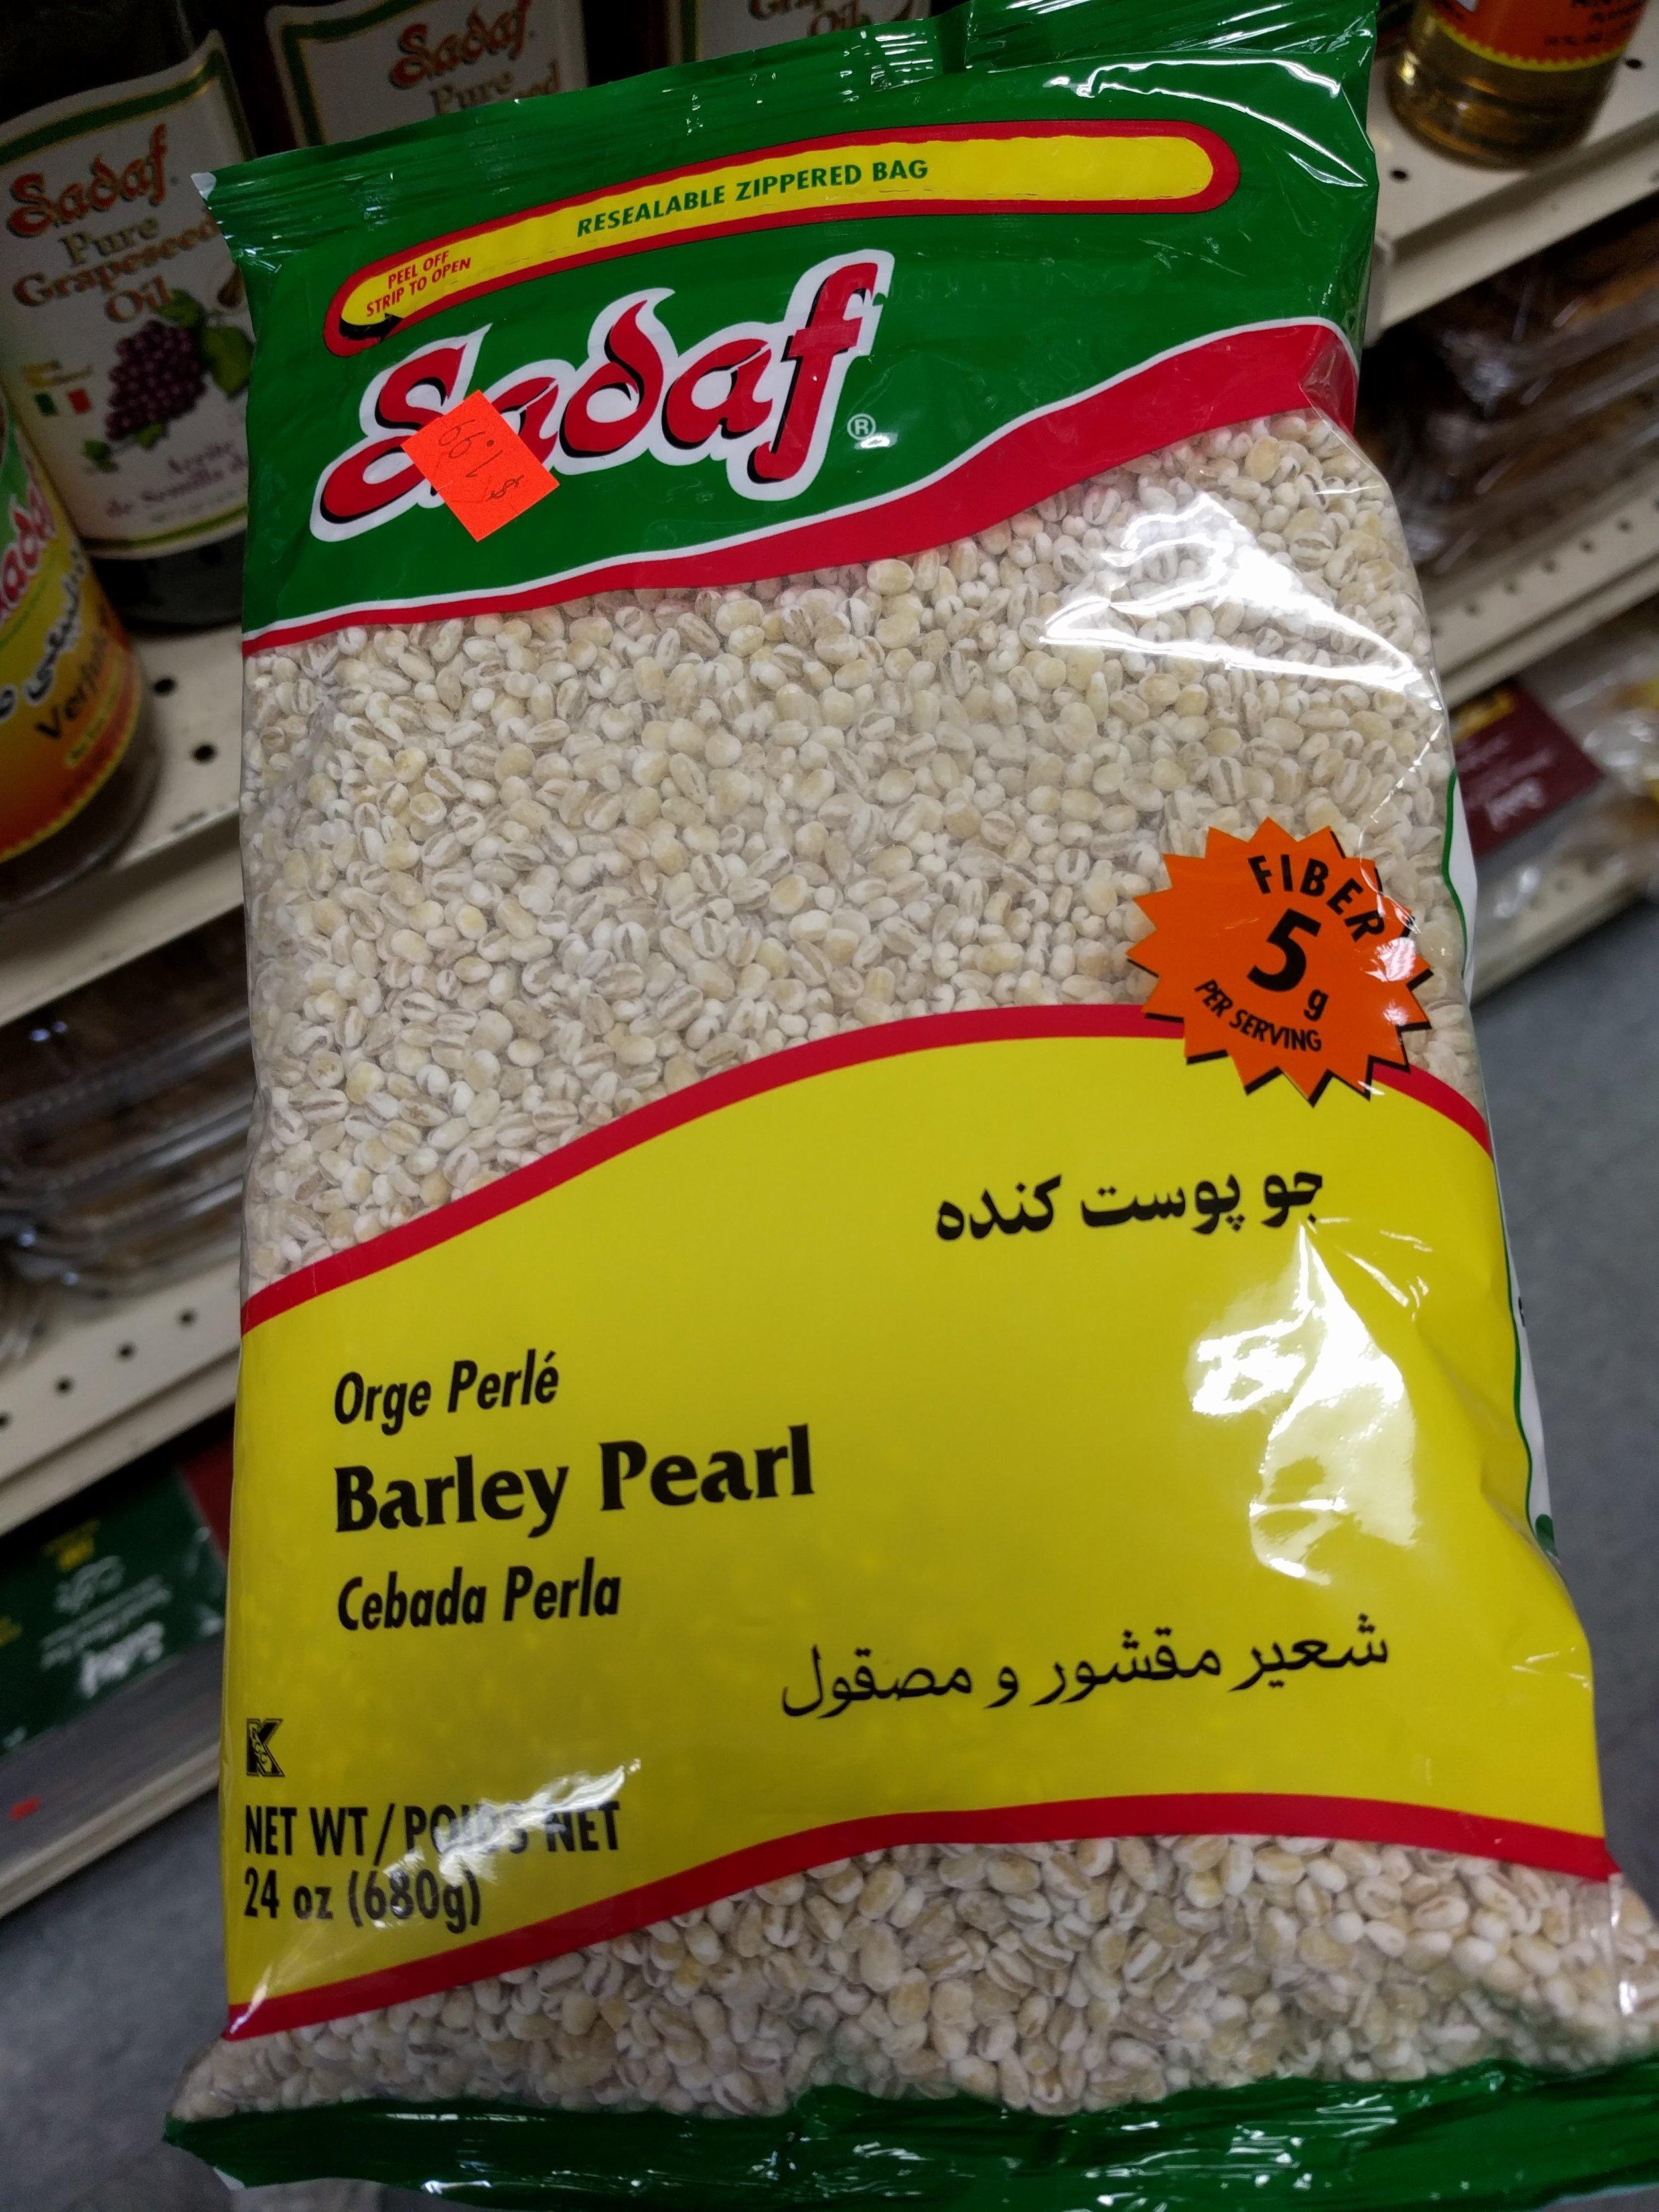 Barley-Pearl-Pak-Halal-International-Foods-12259-W-87th-St-Pkwy-Lenexa-KS-66215.jpg